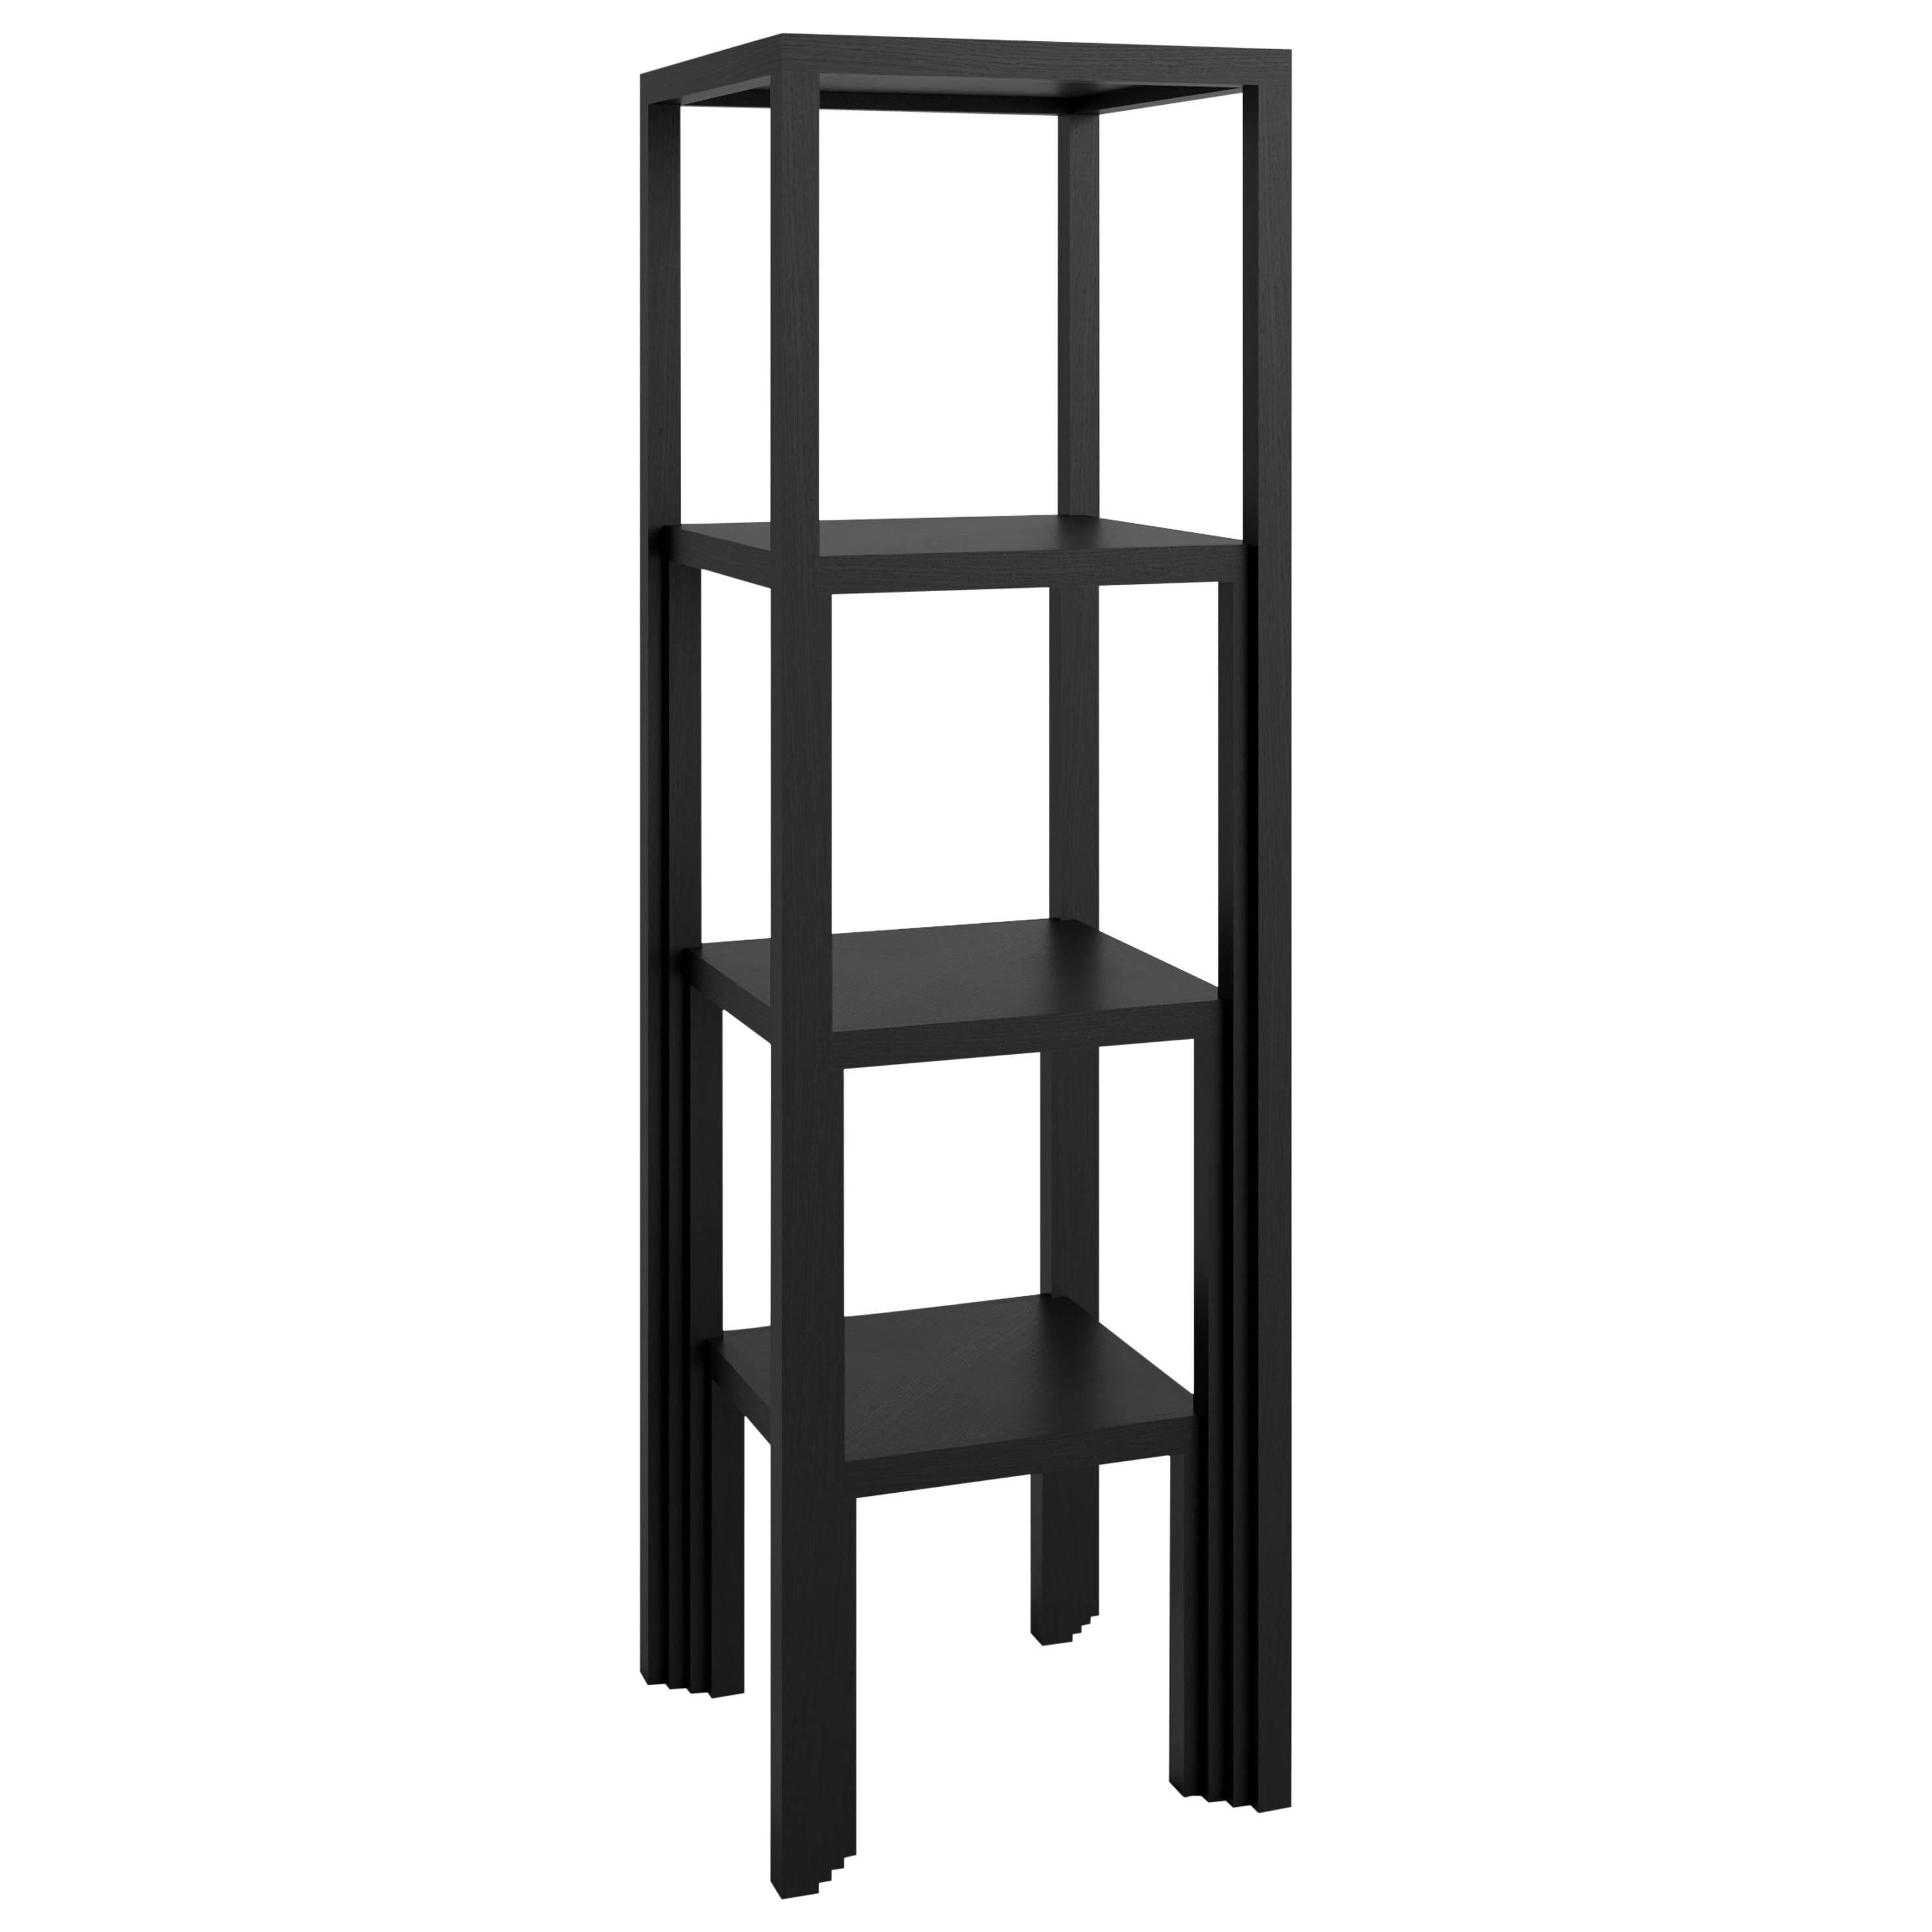 Shelving Unit 'Bookshelf' - Lacquered wood (black) - Art Deco style